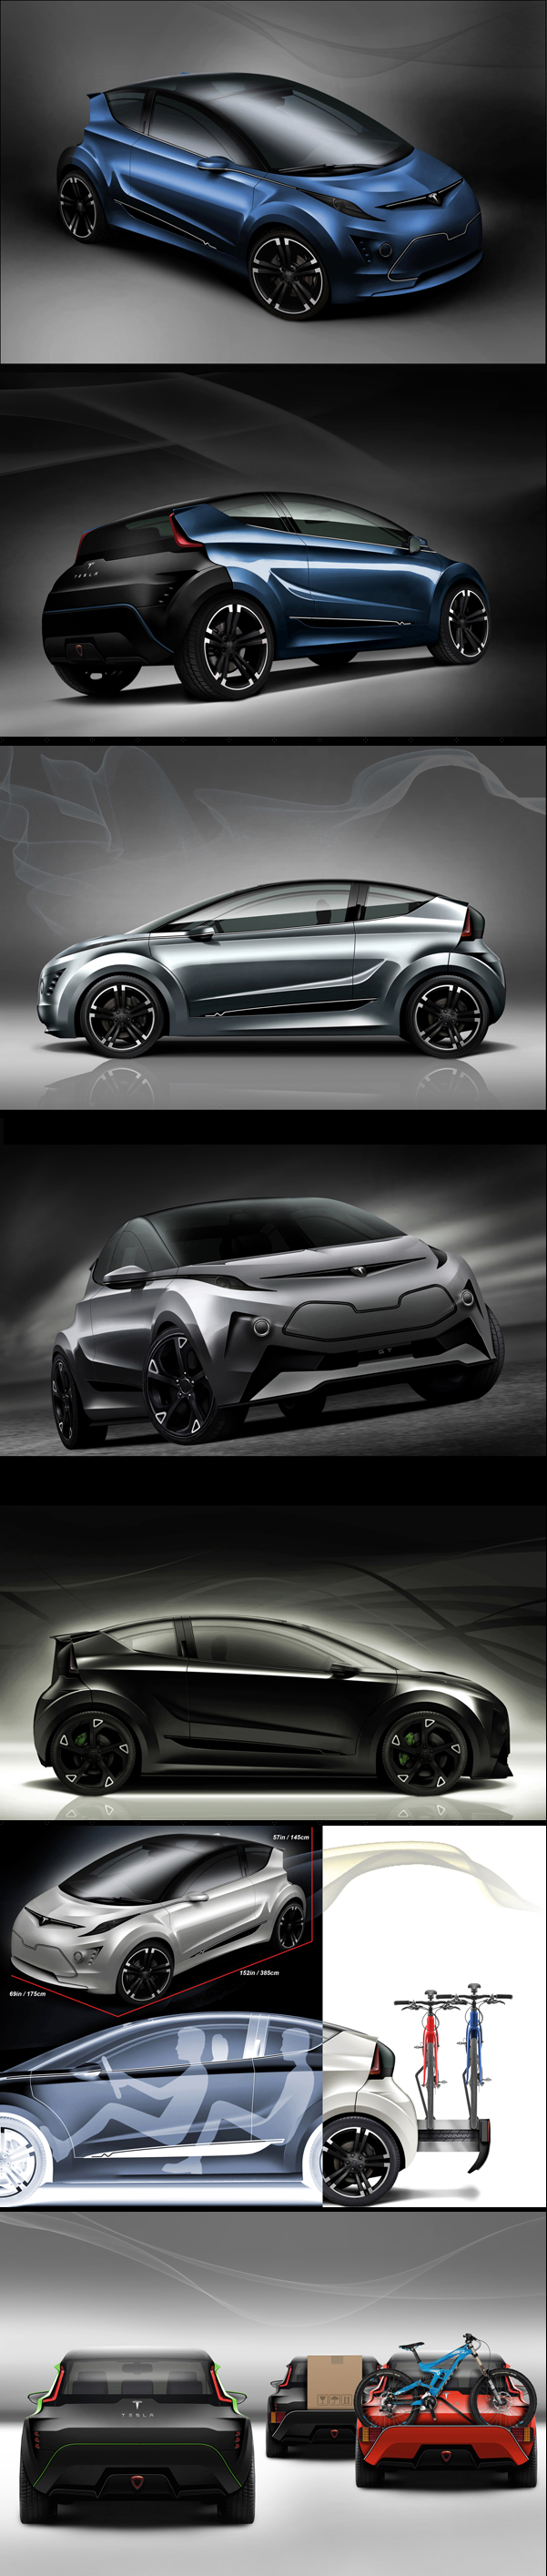 Tesla C, electric-powered city car/hot hatch concept design